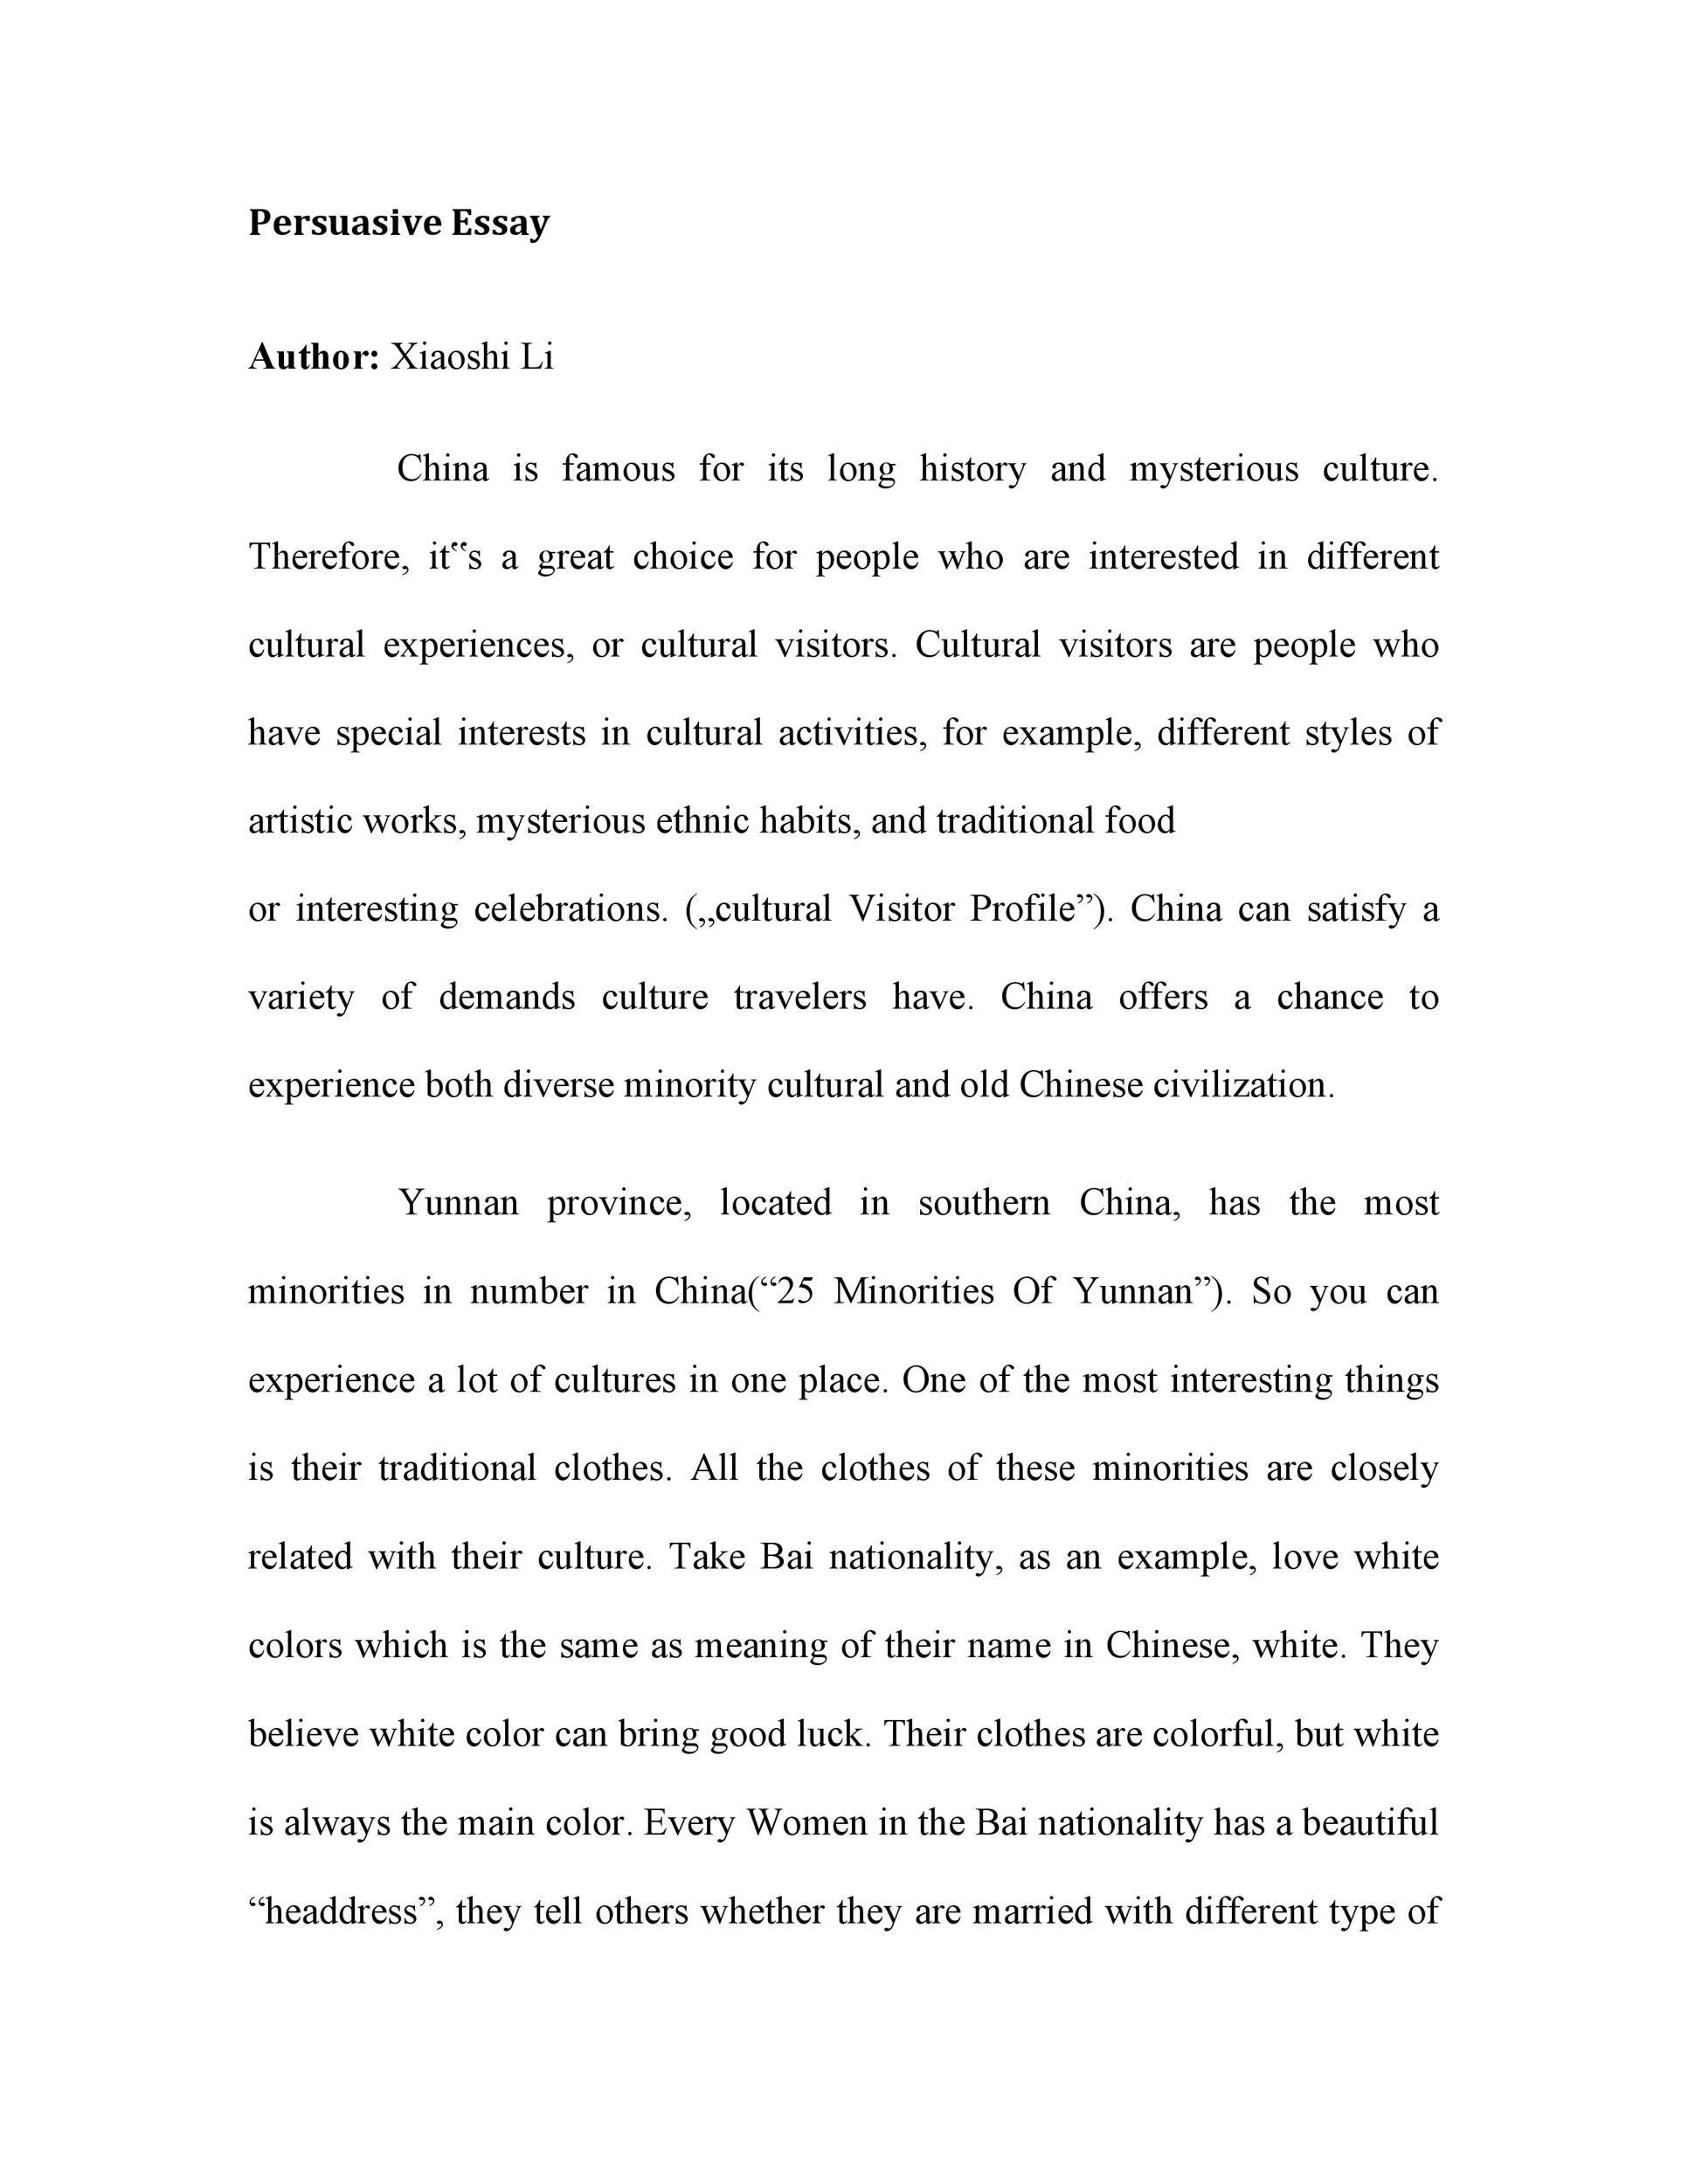 Free persuasive essay example 05